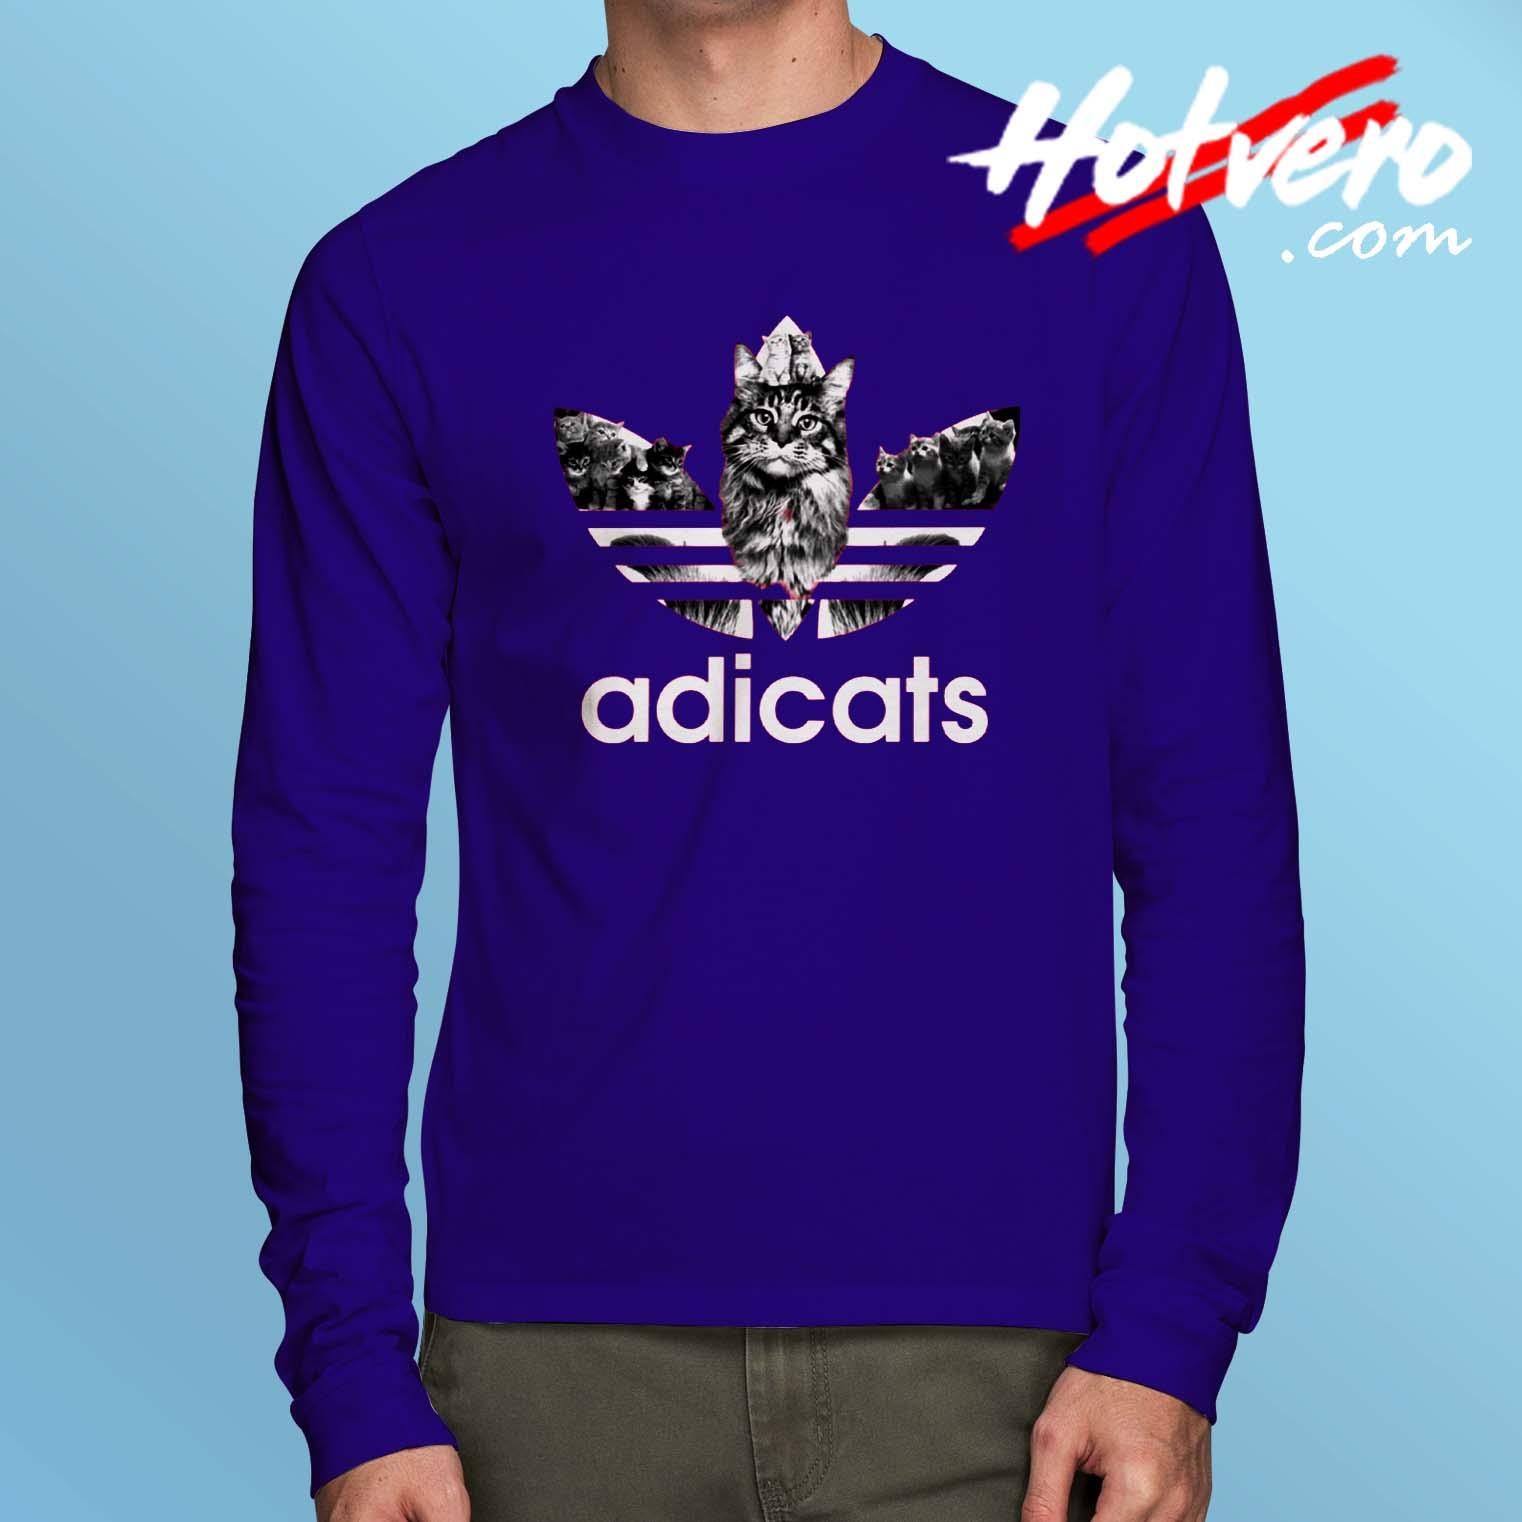 f2afb24b25 Funny Adicats Adidas Parody Long Sleeve T Shirt - Hotvero.com